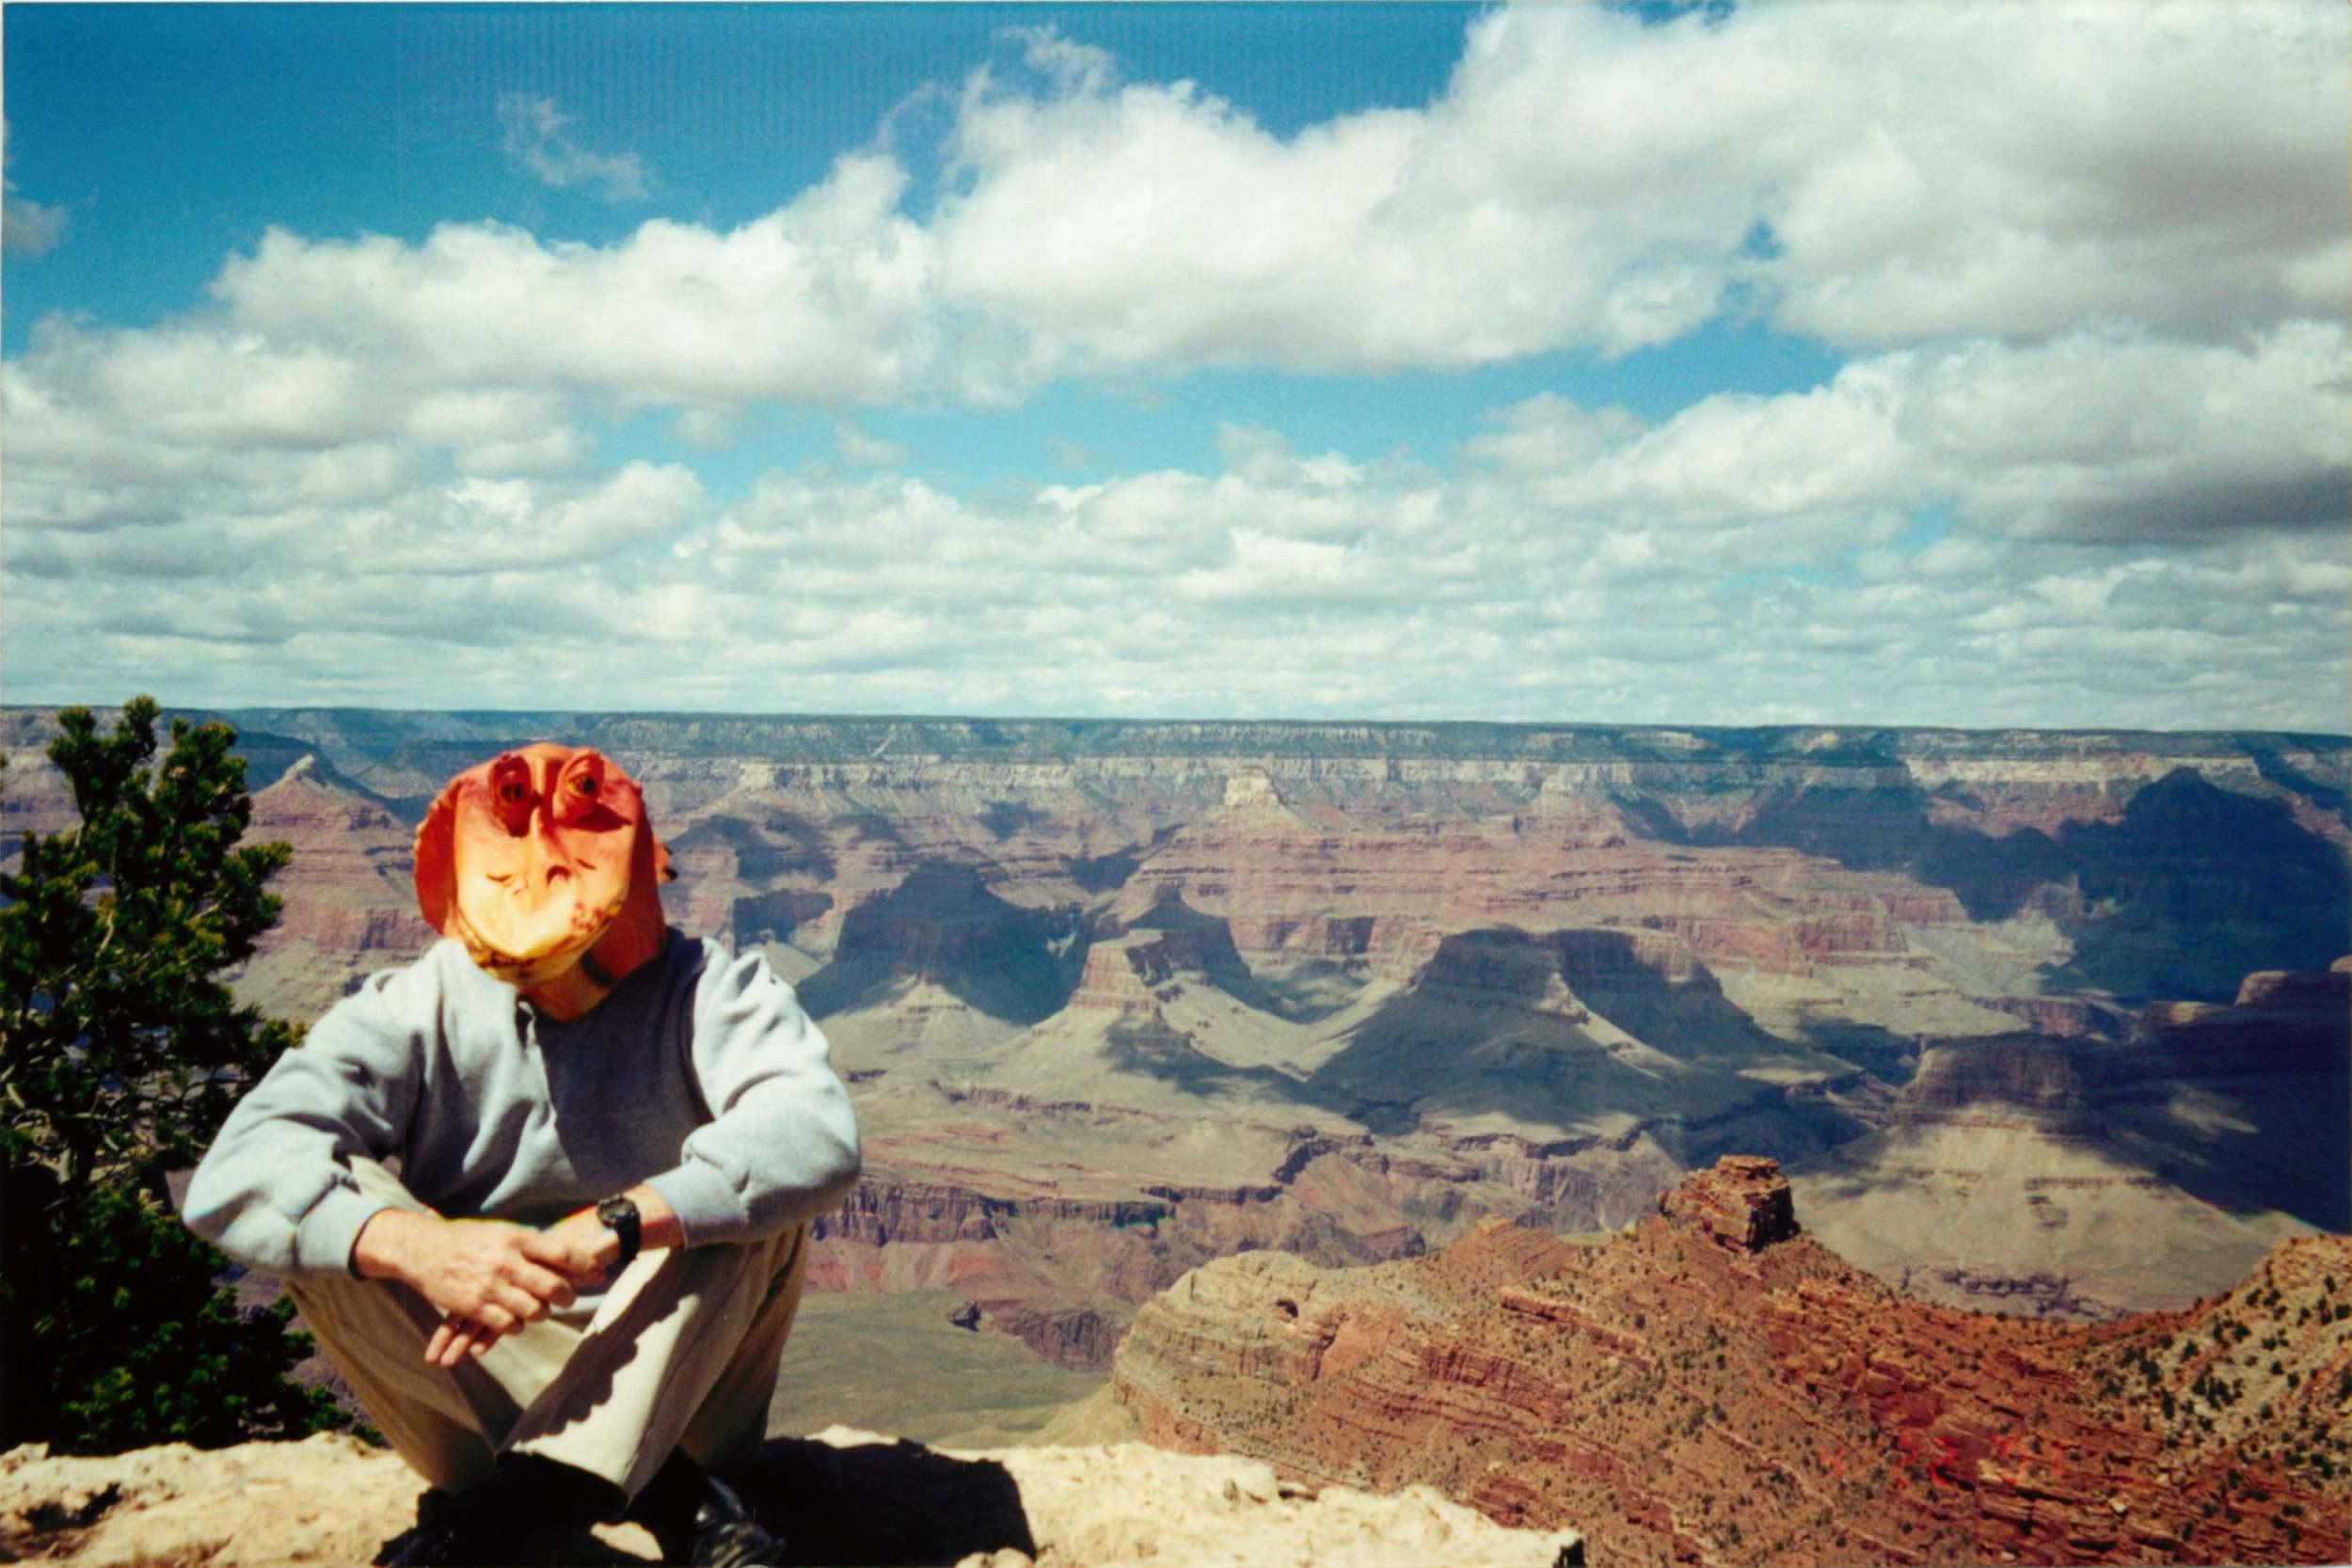 Grand Canyon, AZ 5.jpg